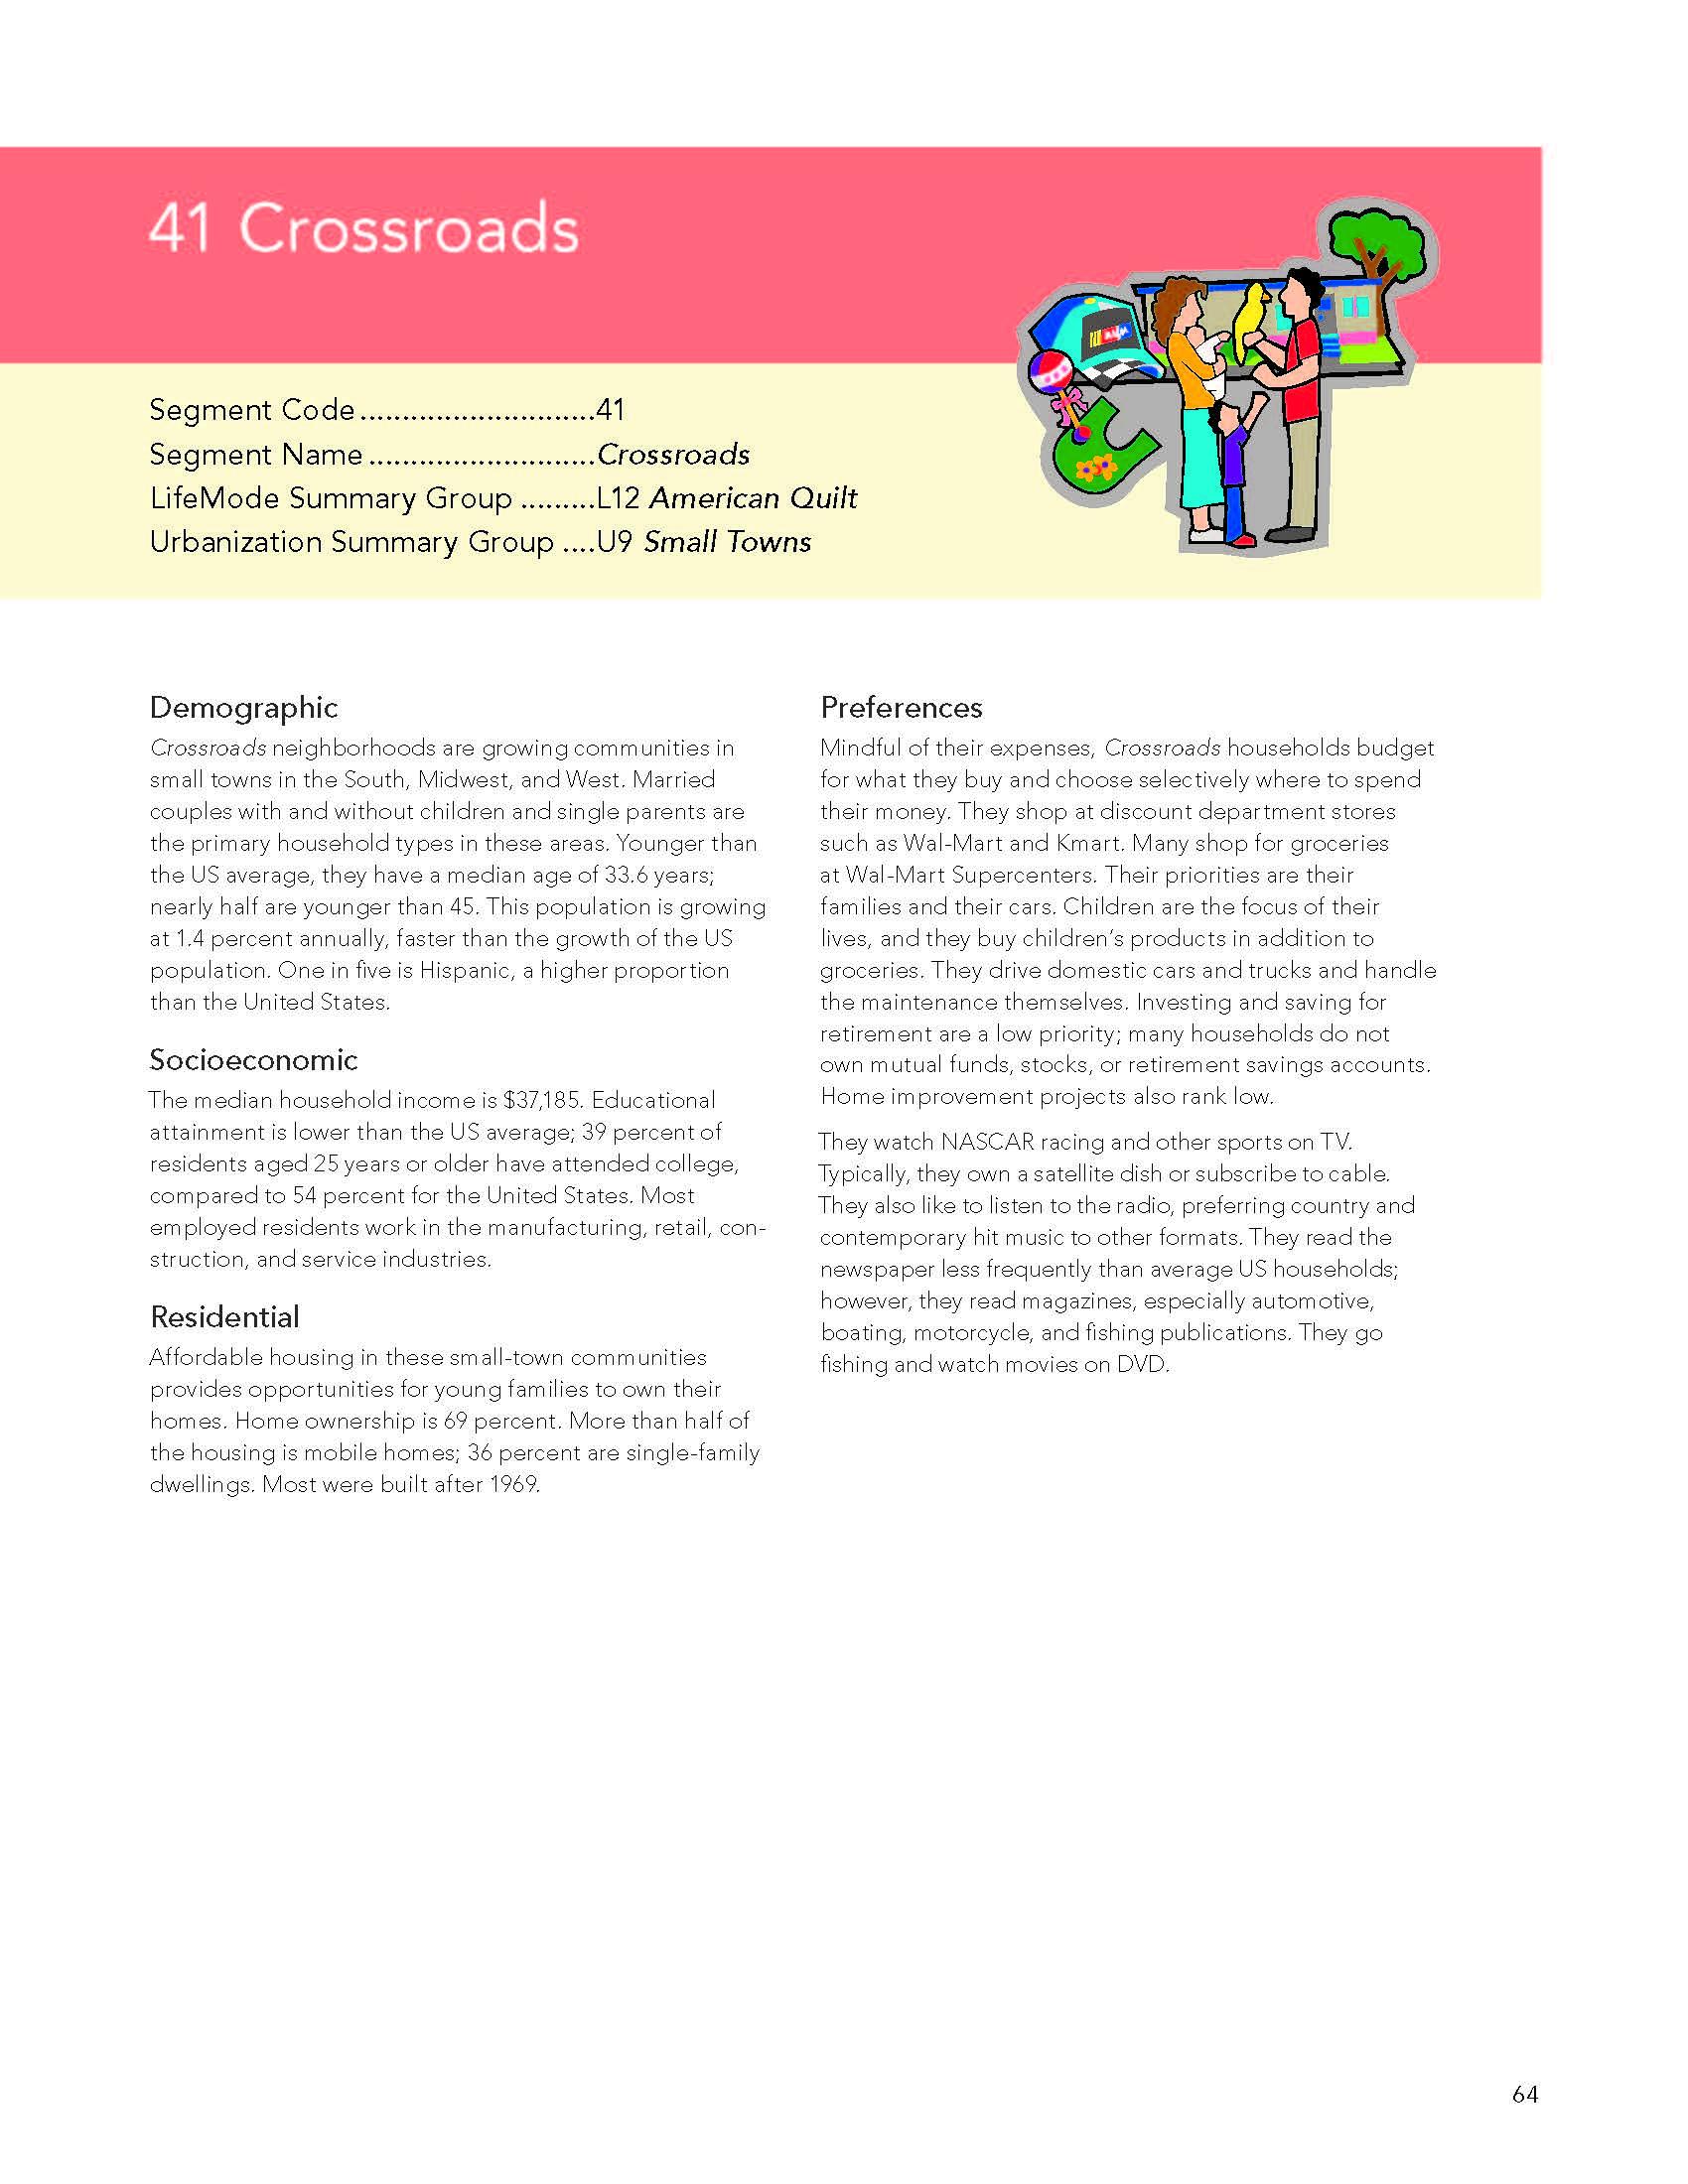 tapestry-segmentation_Page_67.jpg